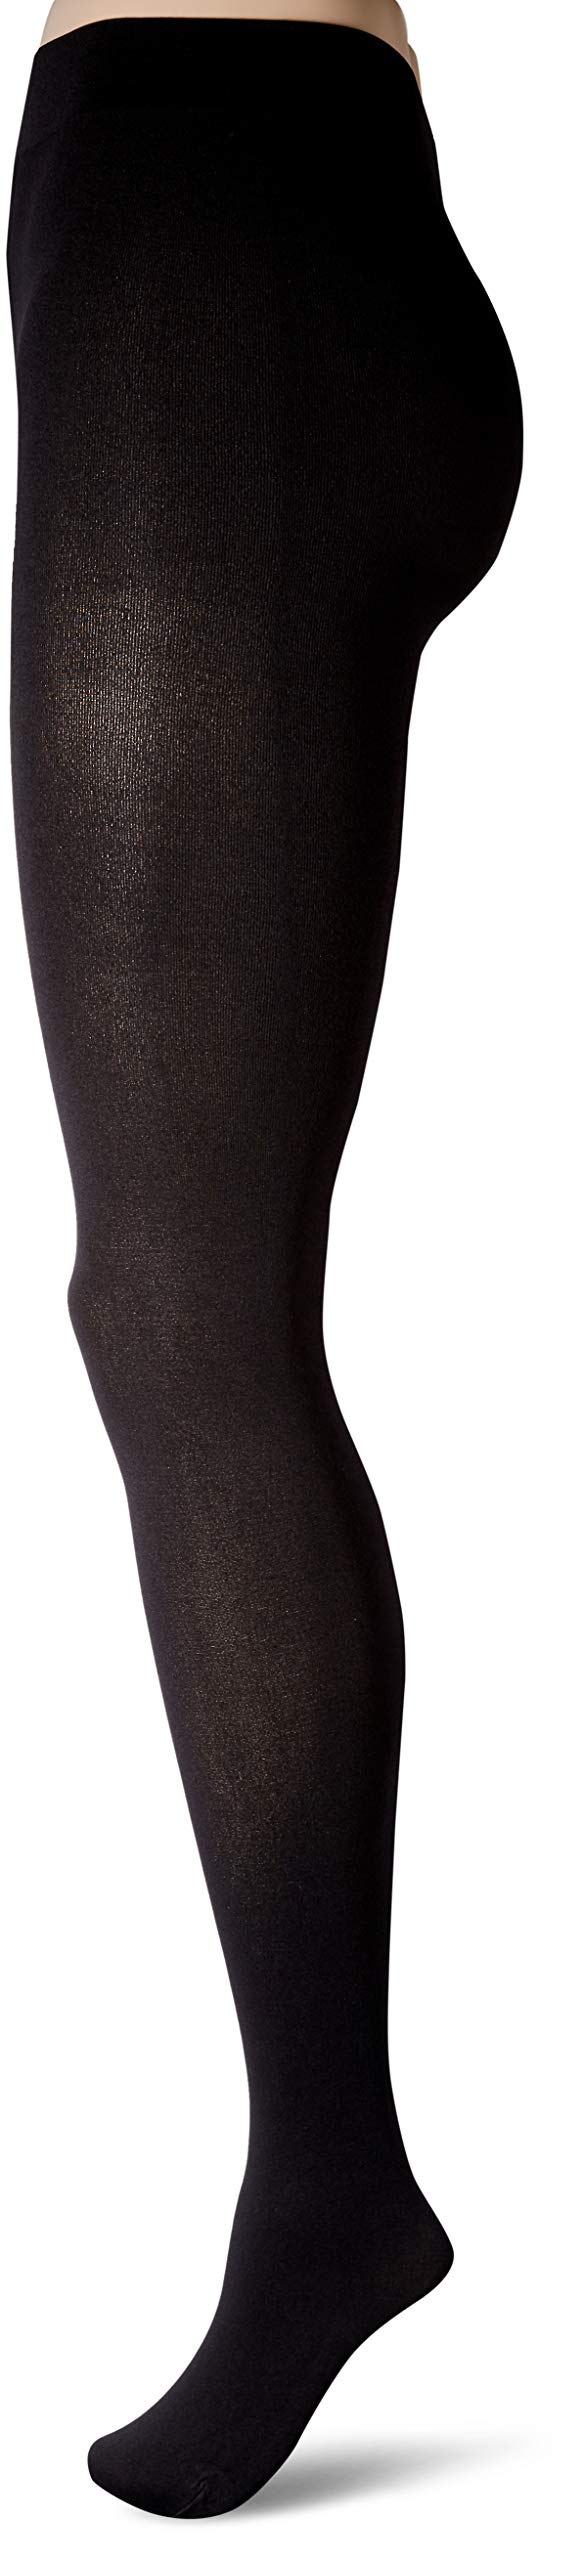 Hanes Silk Reflections Women's Plus Size Hanes Curves